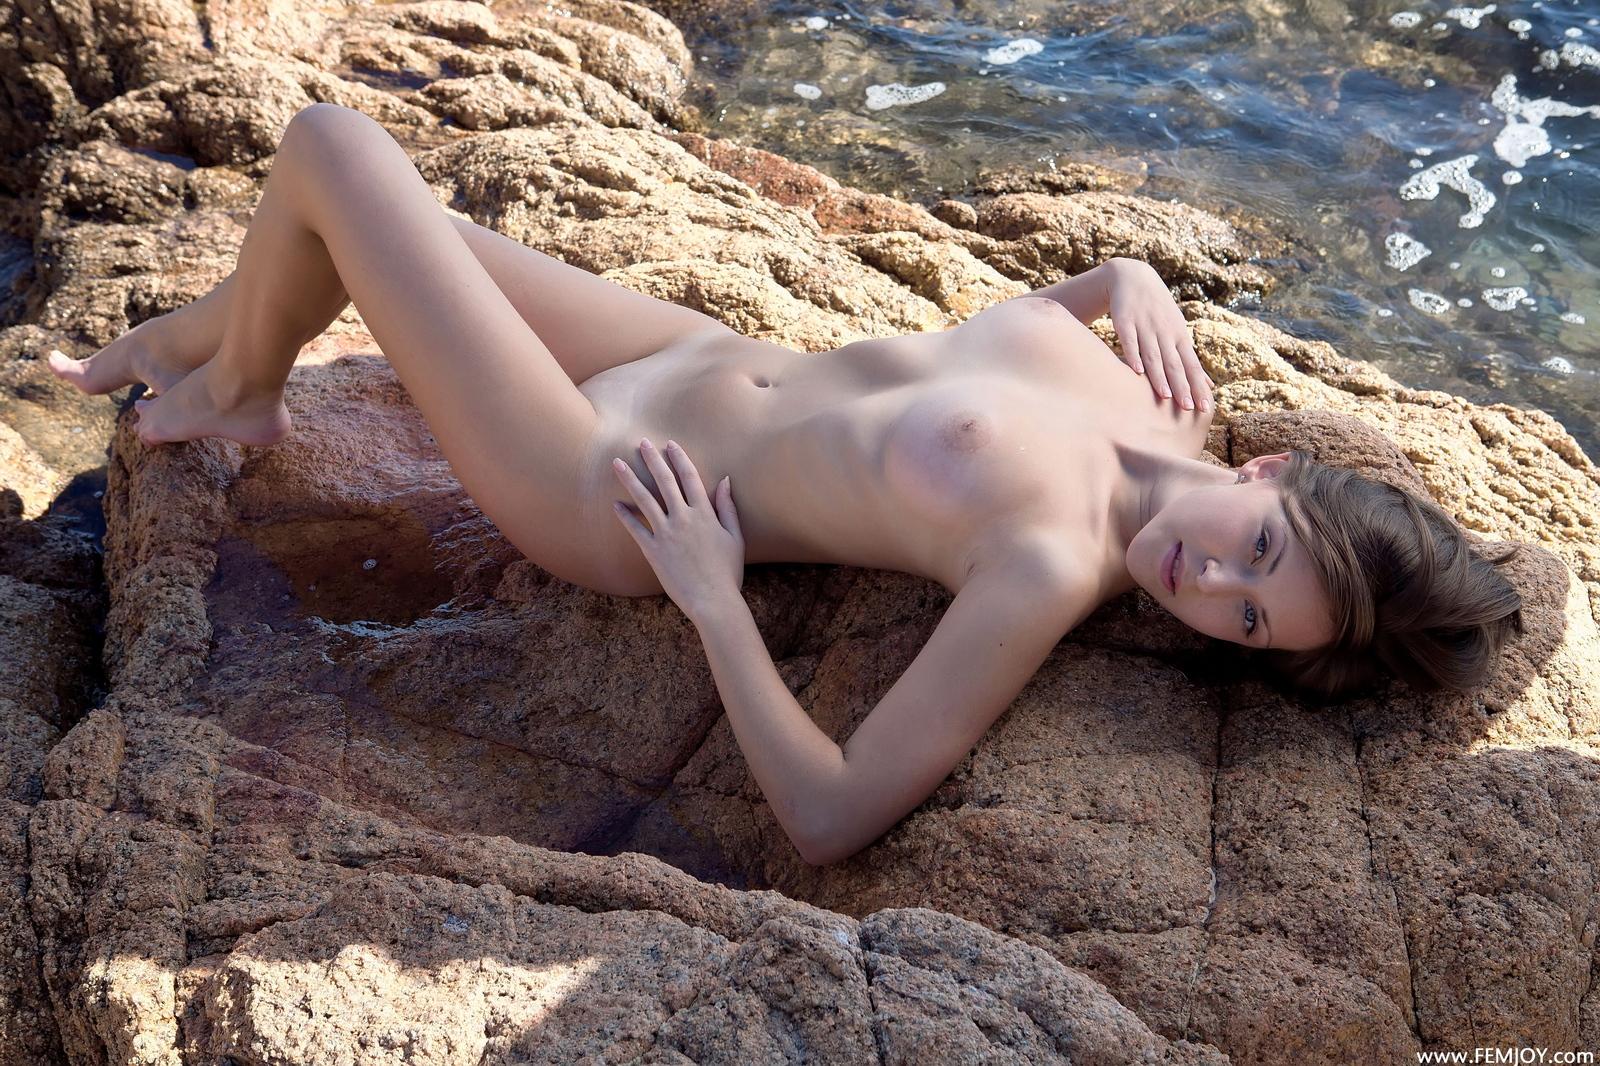 sophia-h-seaside-naked-boobs-rocks-femjoy-06